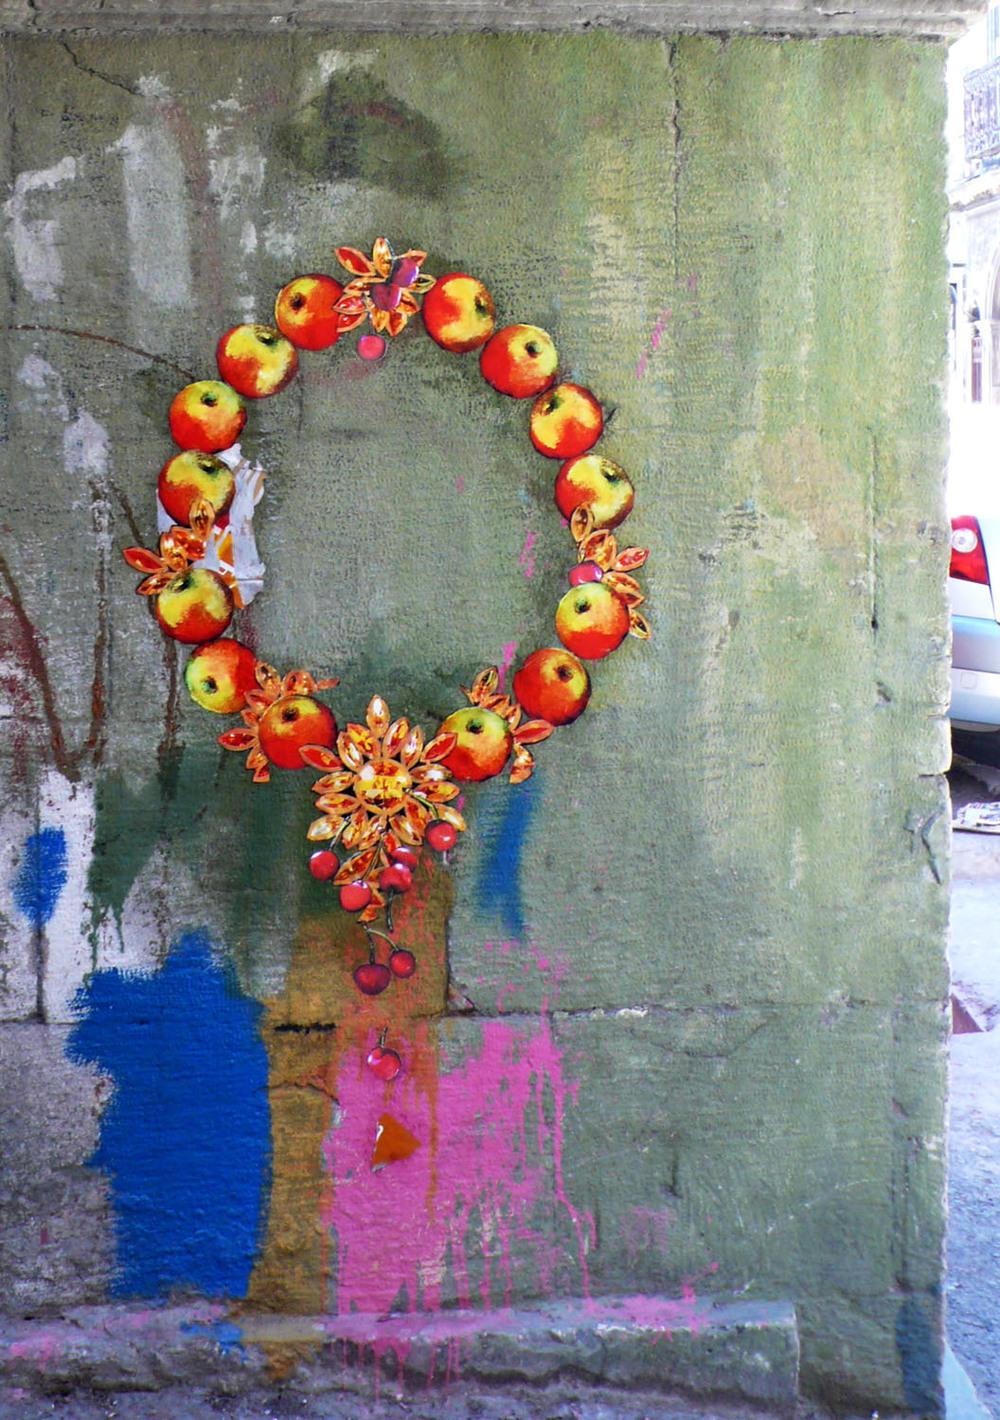 Necklace of Abundance, Istanbul